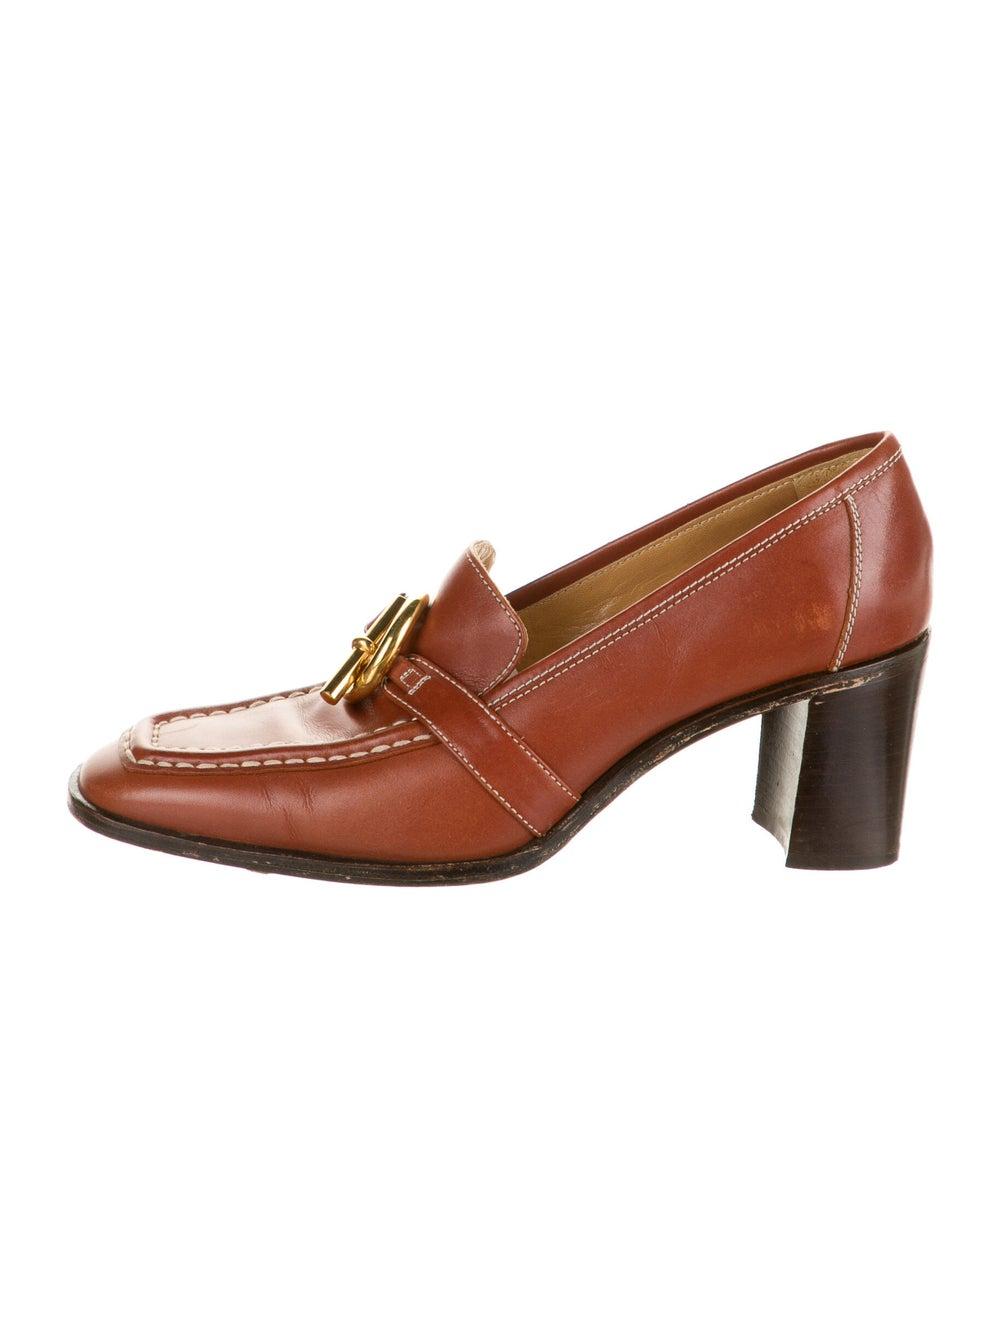 Hermès Vintage Leather Pumps - image 1